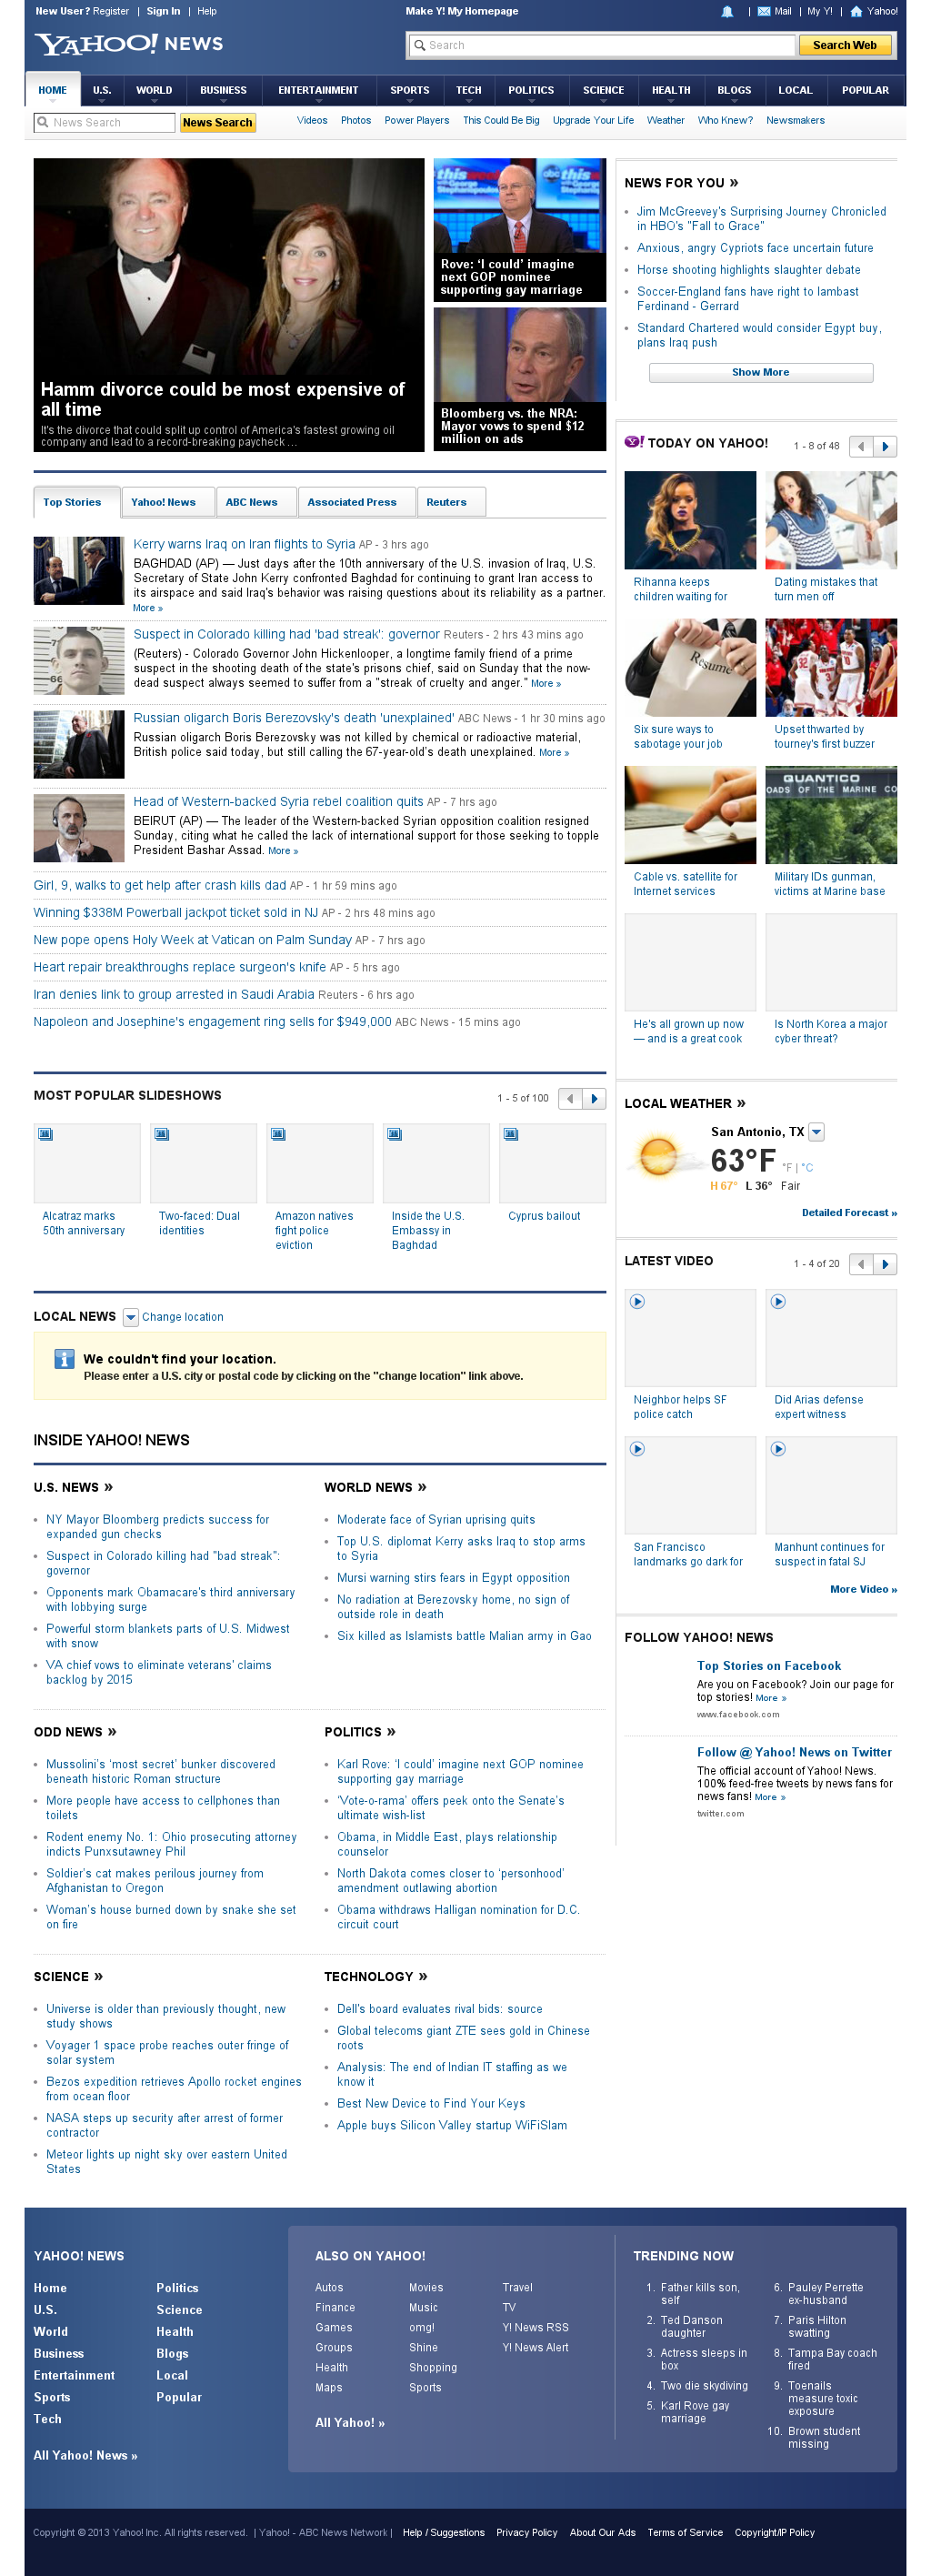 Yahoo! News at Sunday March 24, 2013, 9:47 p.m. UTC